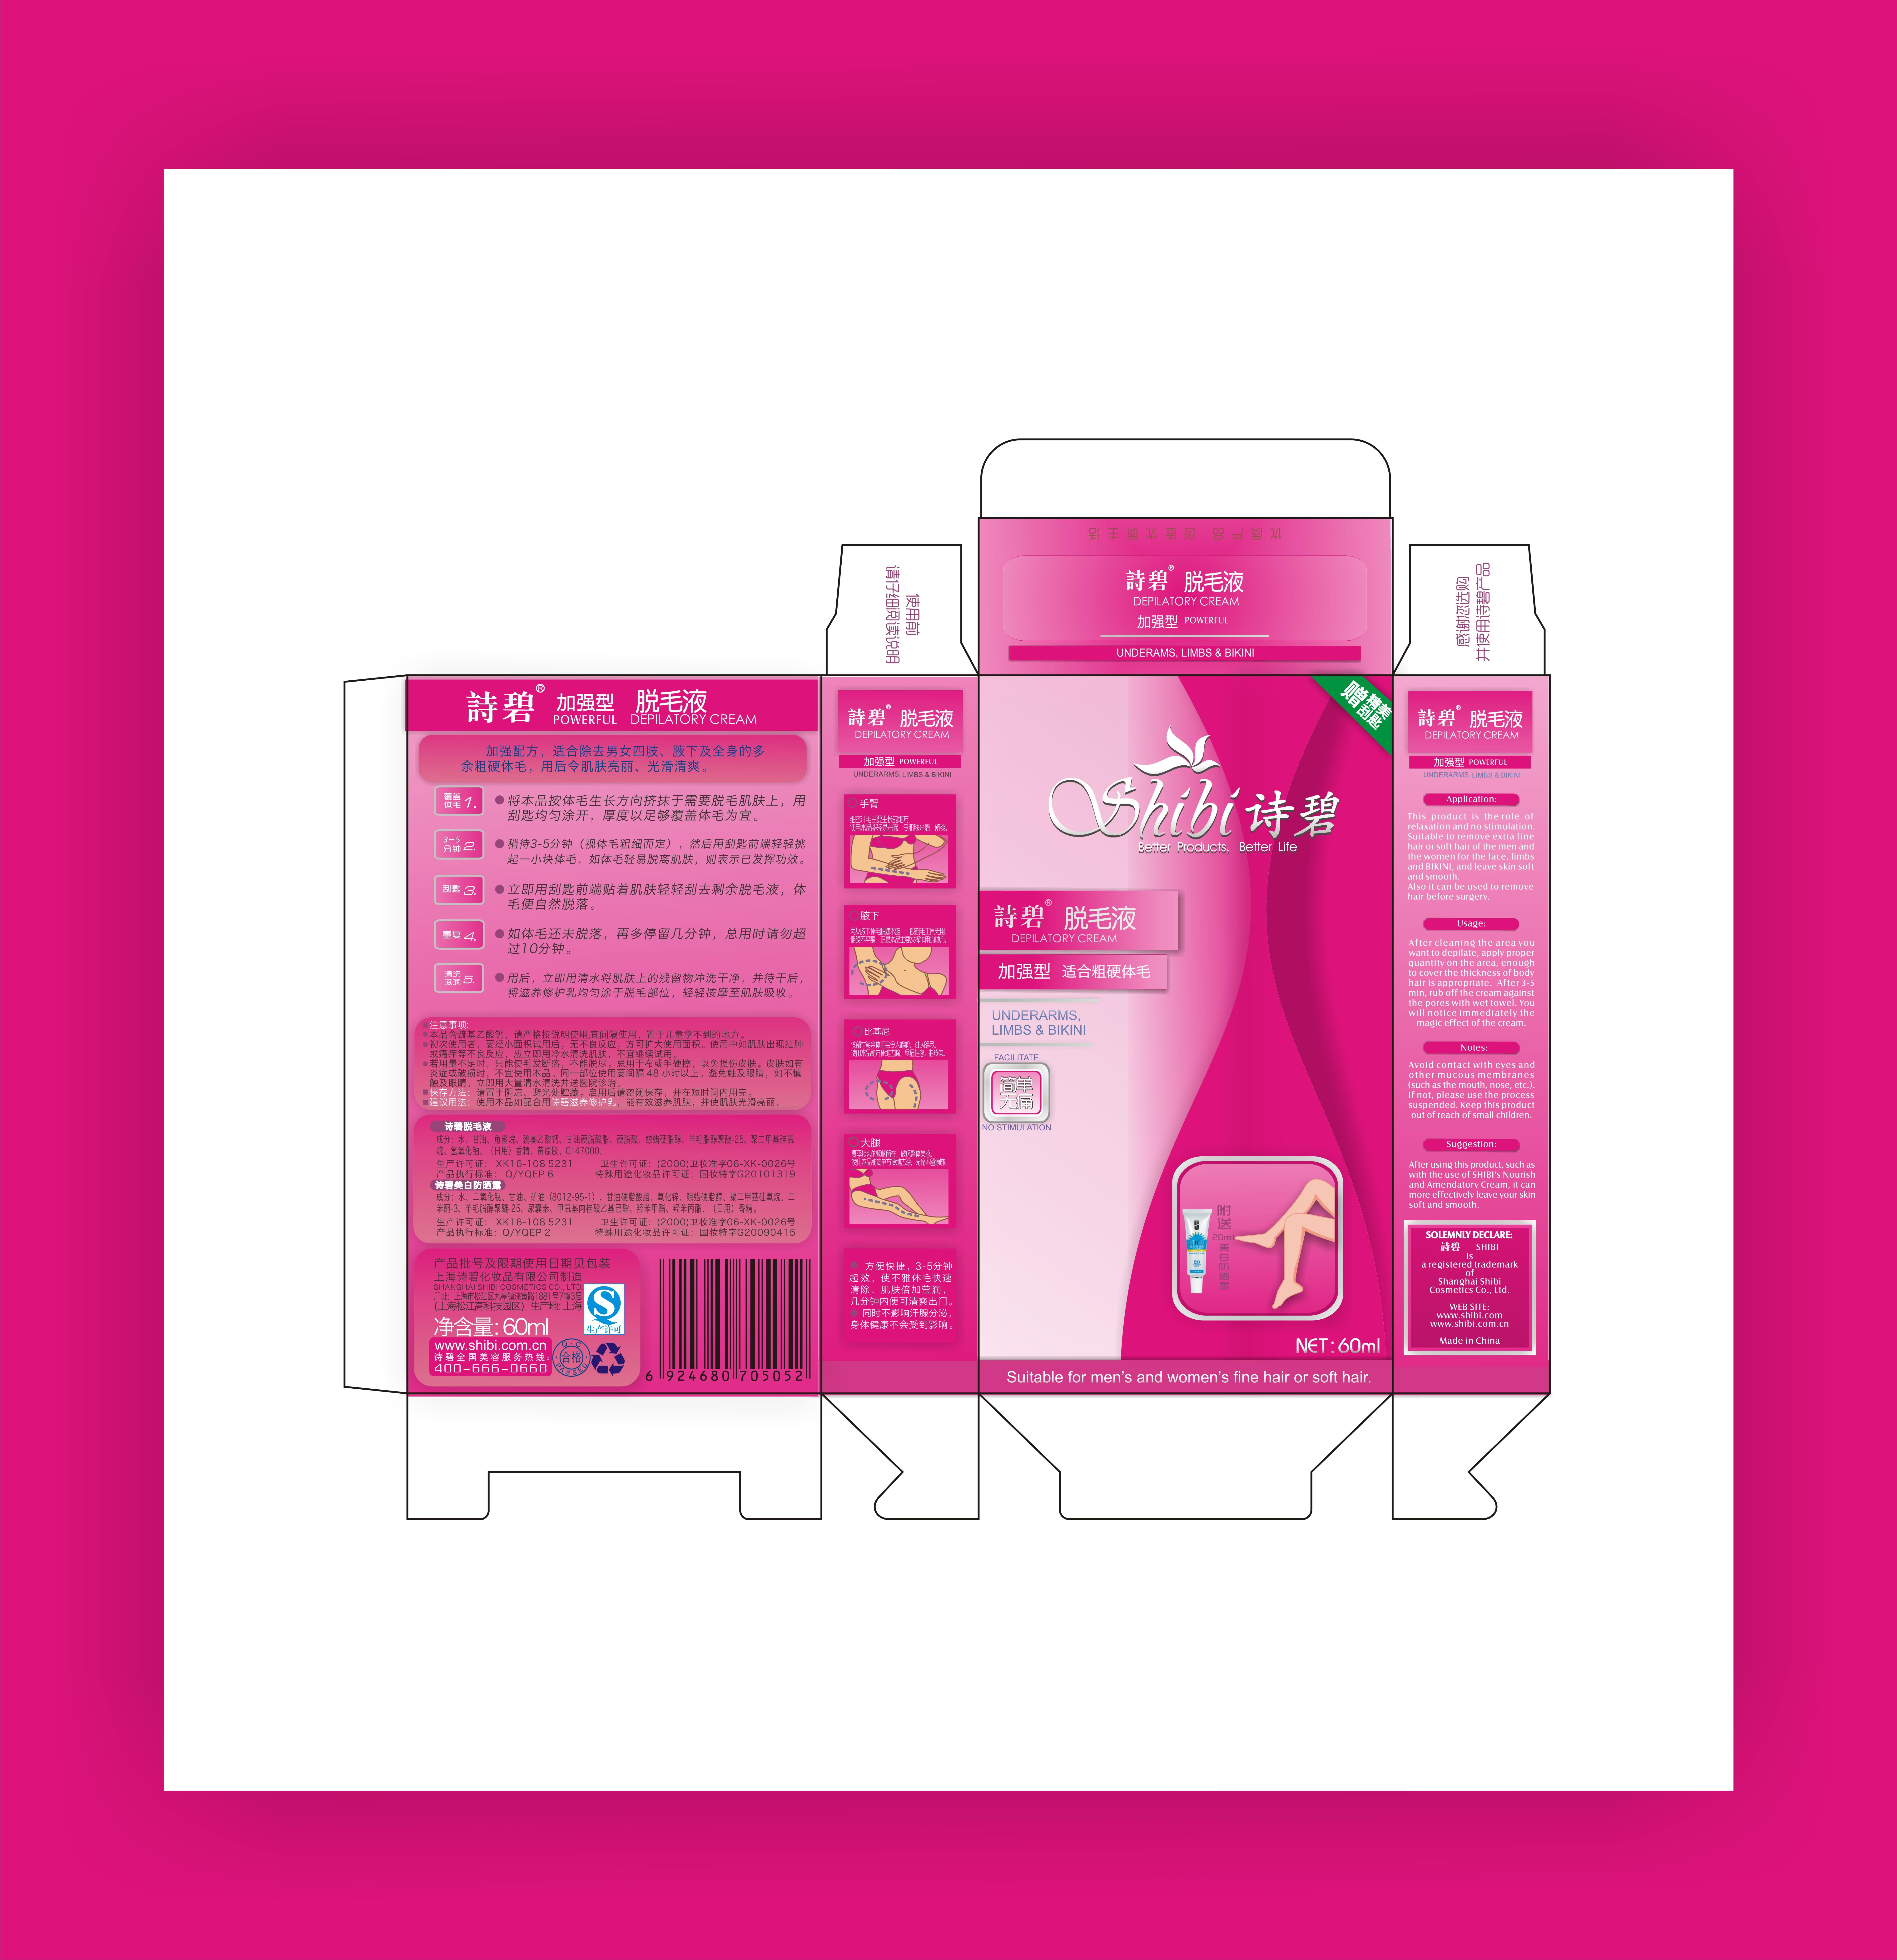 Packaging Design by Shailender Kumar - Entry No. 26 in the Packaging Design Contest Creative Packaging Design for Shibi-诗碧.